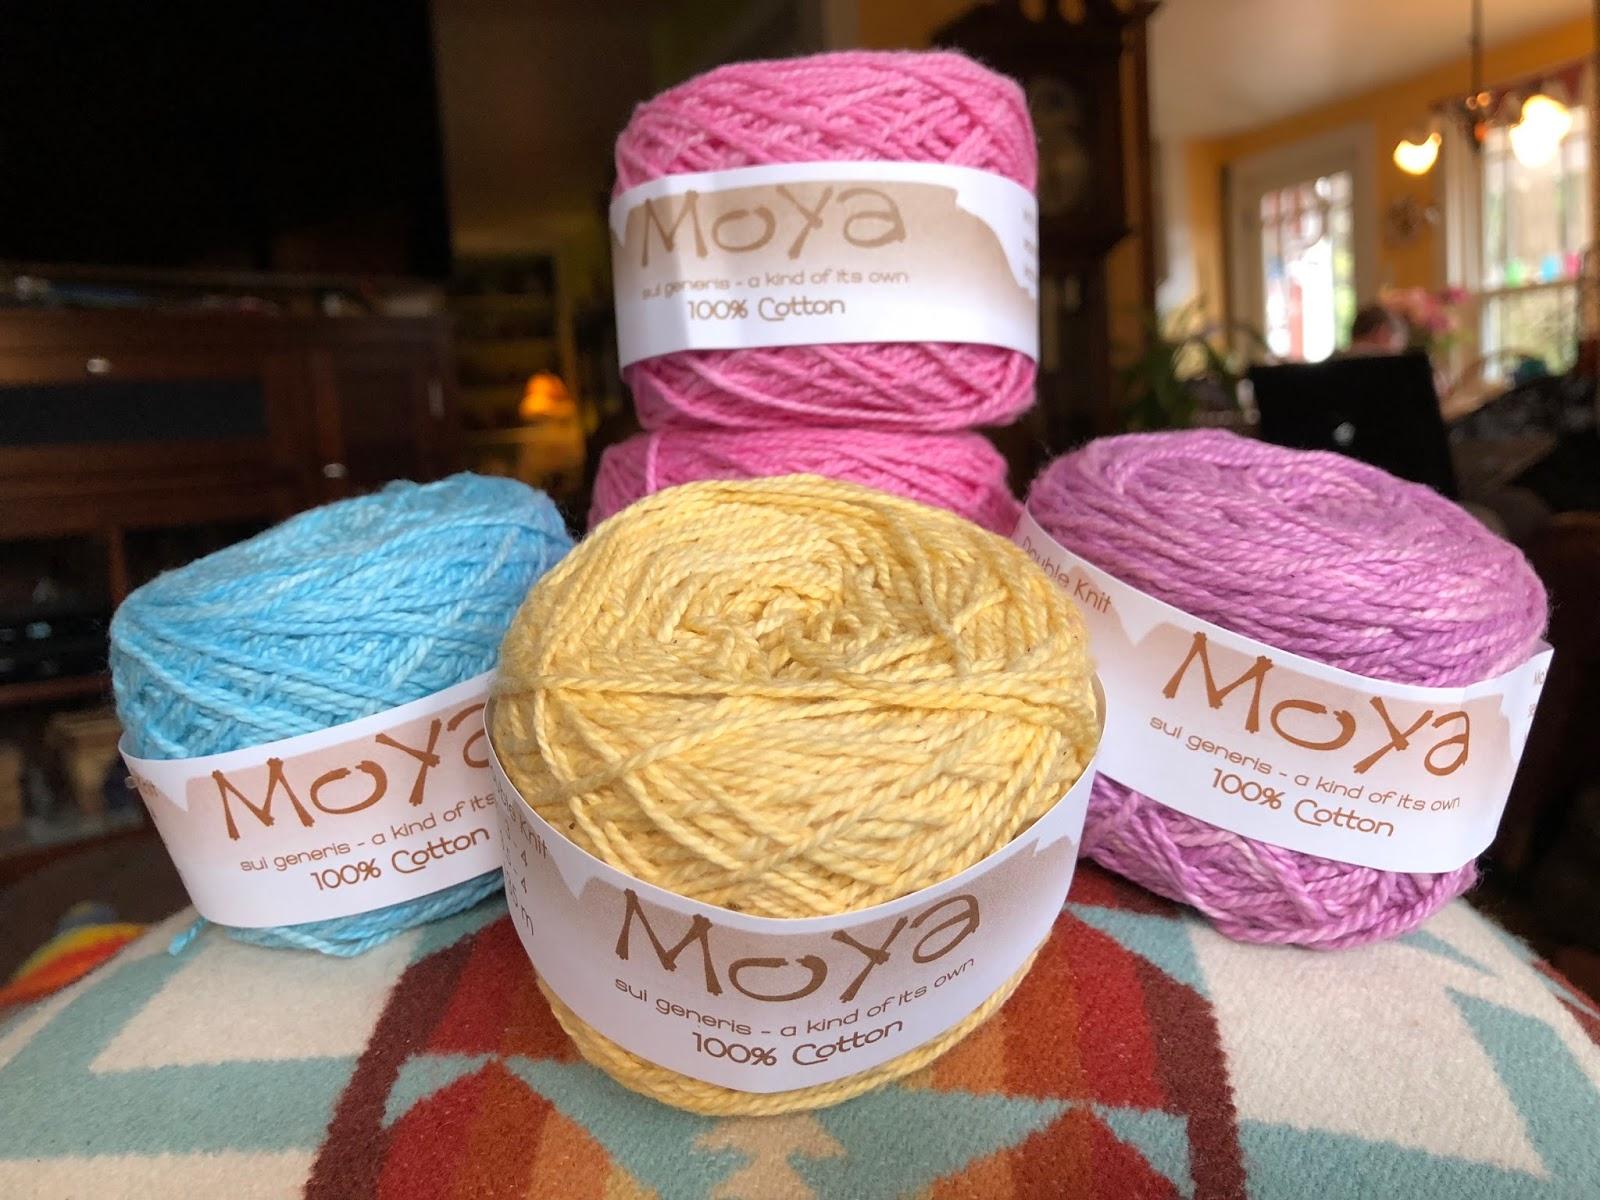 Cotton Knitting Yarn Australia : Teresa kasner cotton yarn new gravel kitchen garden and my pottery